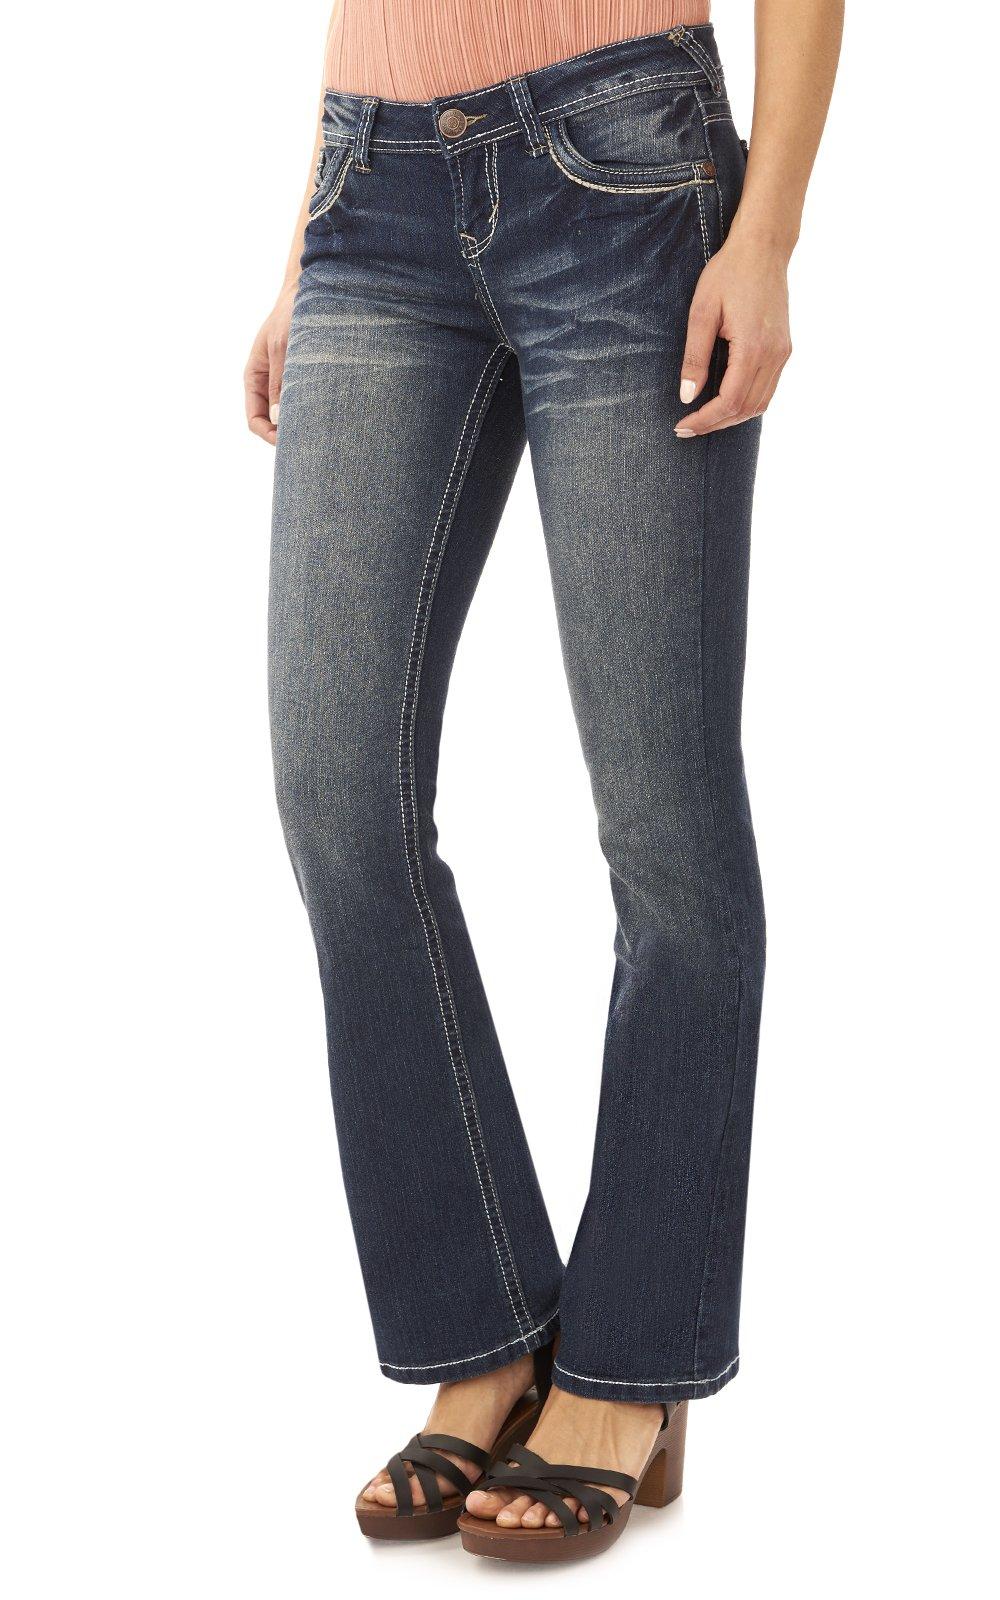 Wallflower Women S Juniors Classic Legendary Stretch Bootcut Denim Jeans Denim Fit